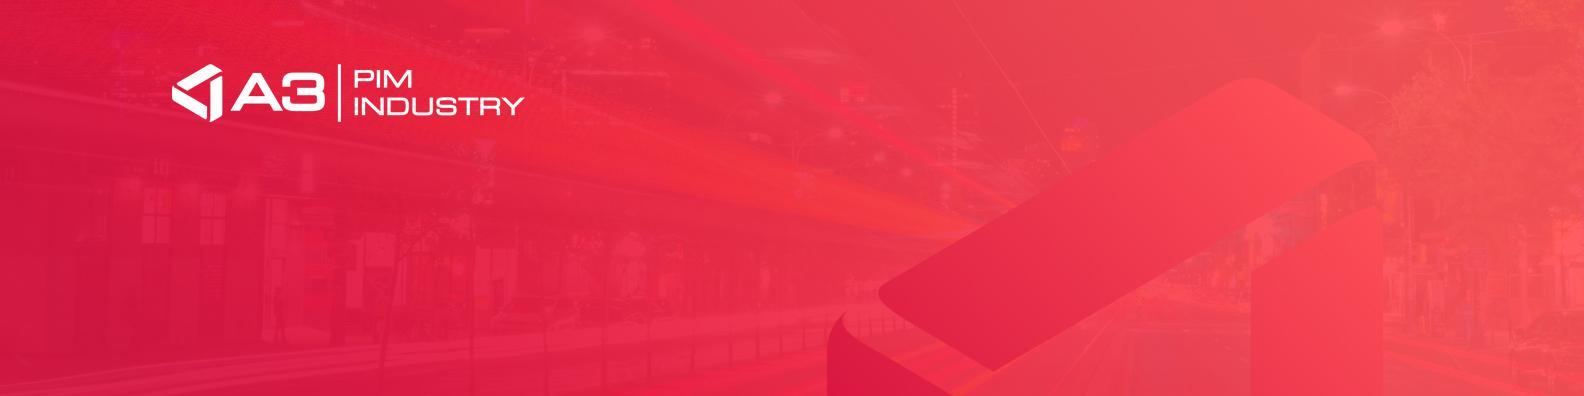 Review A3 | PIM INDUSTRY: Optimizing product data management - Appvizer